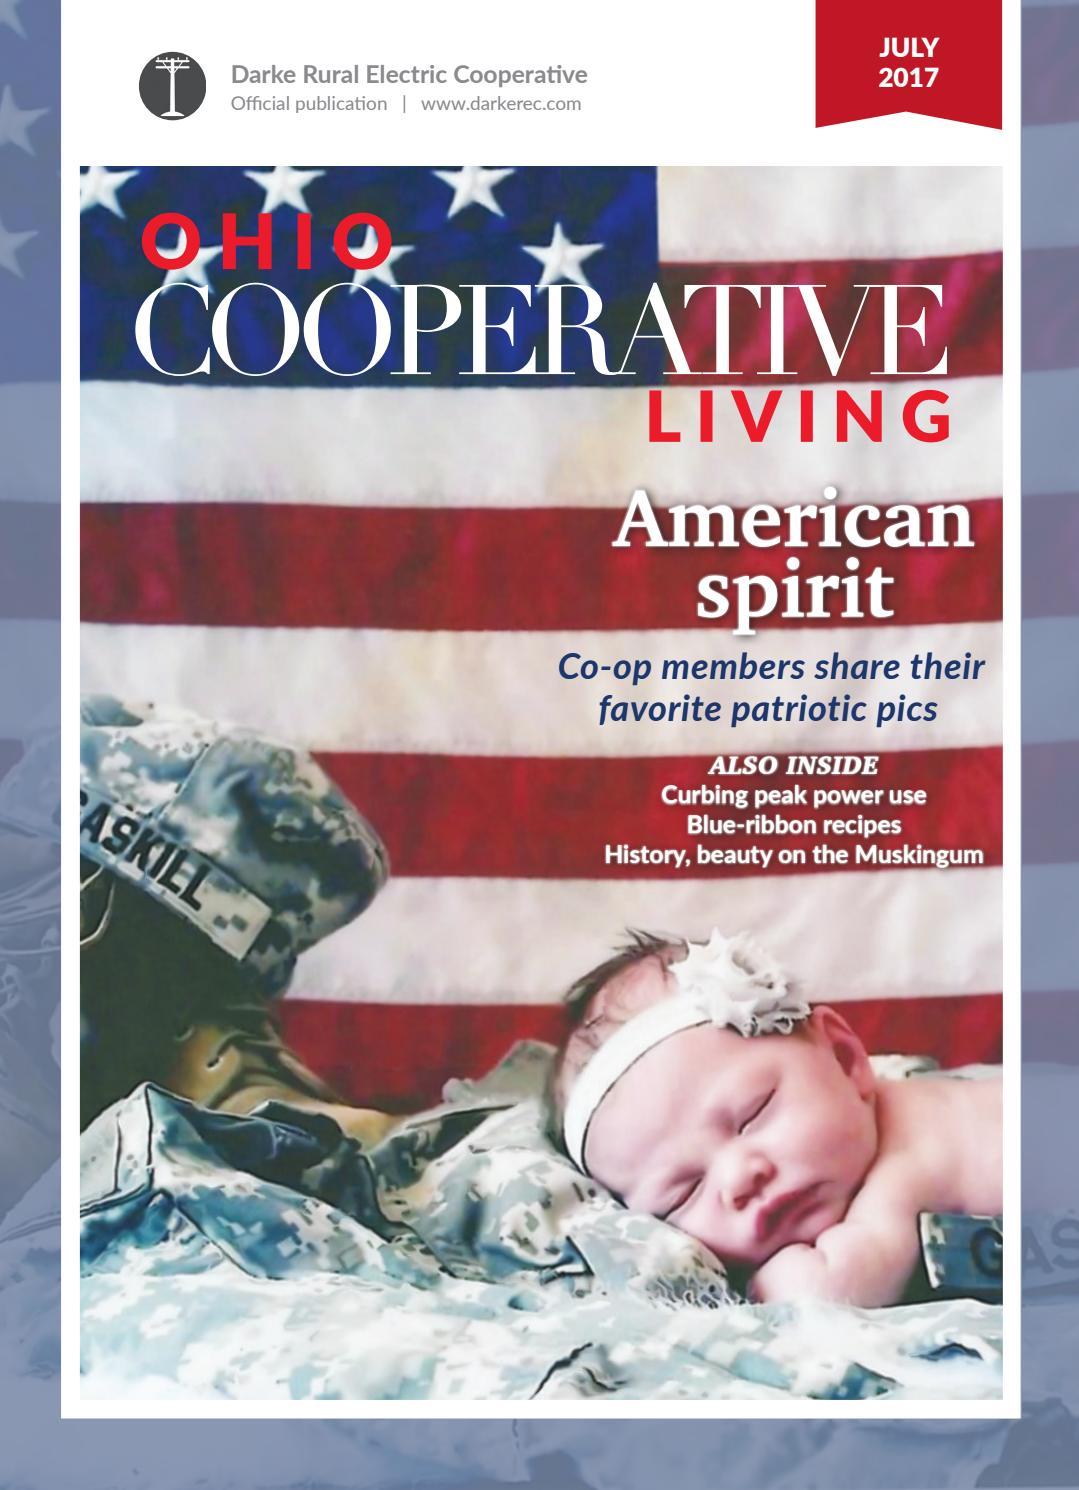 Ohio cooperative living july 2017 darke by Ohio Cooperative